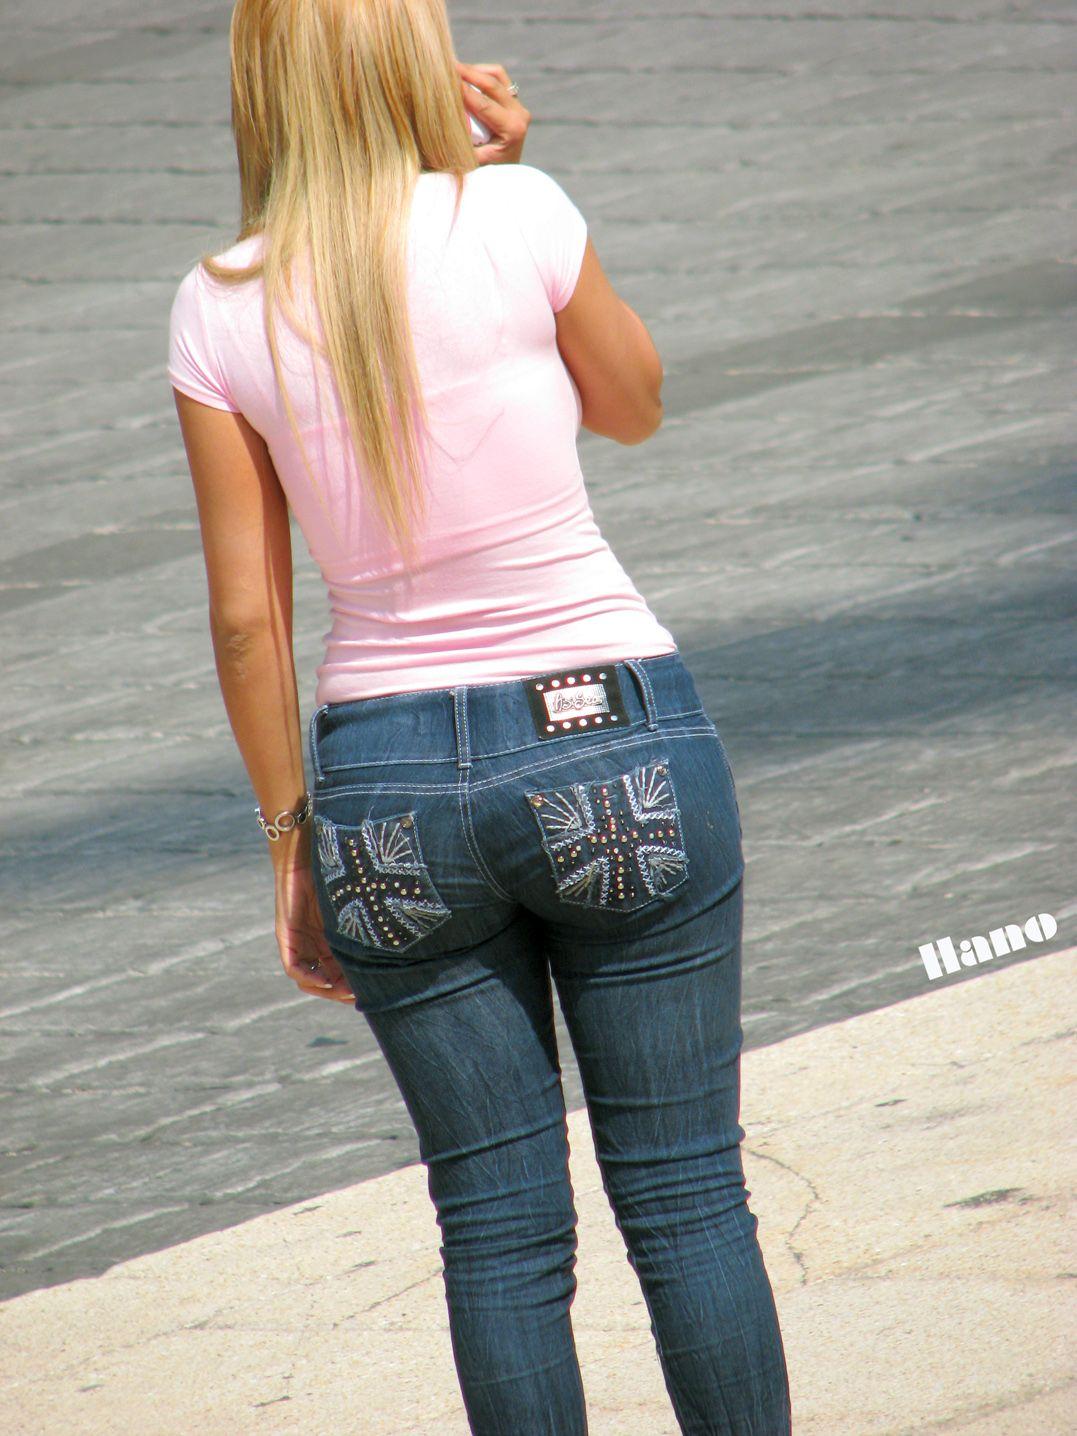 Candid bubble butt mature milf